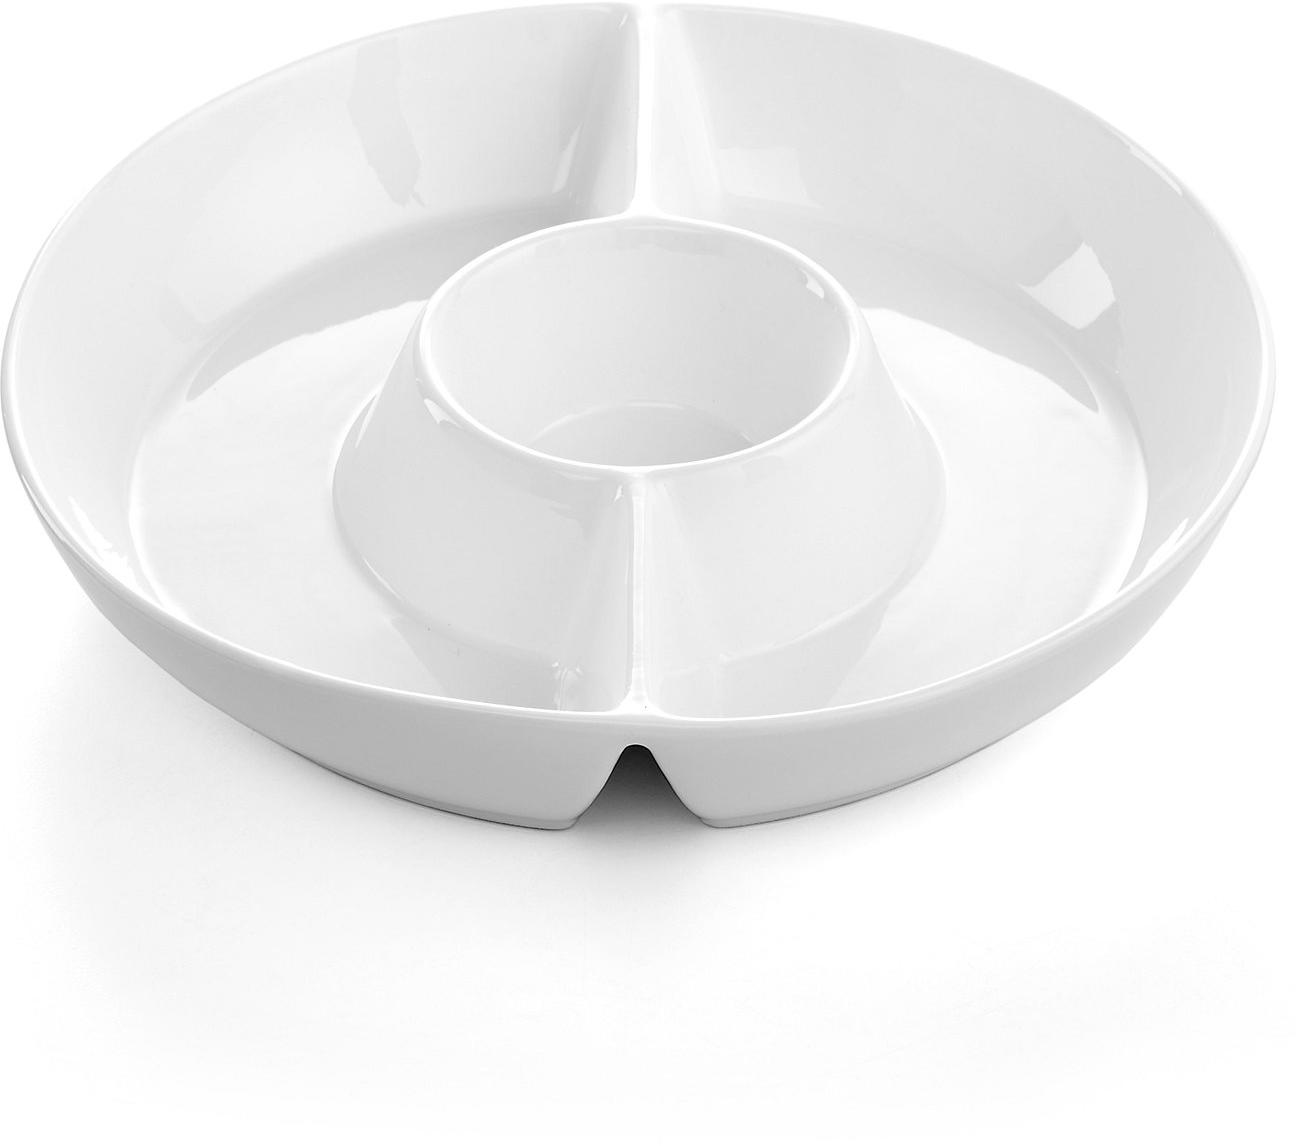 The Cellar Whiteware Crudite Server - Serveware - Dining & Entertaining - Macy's